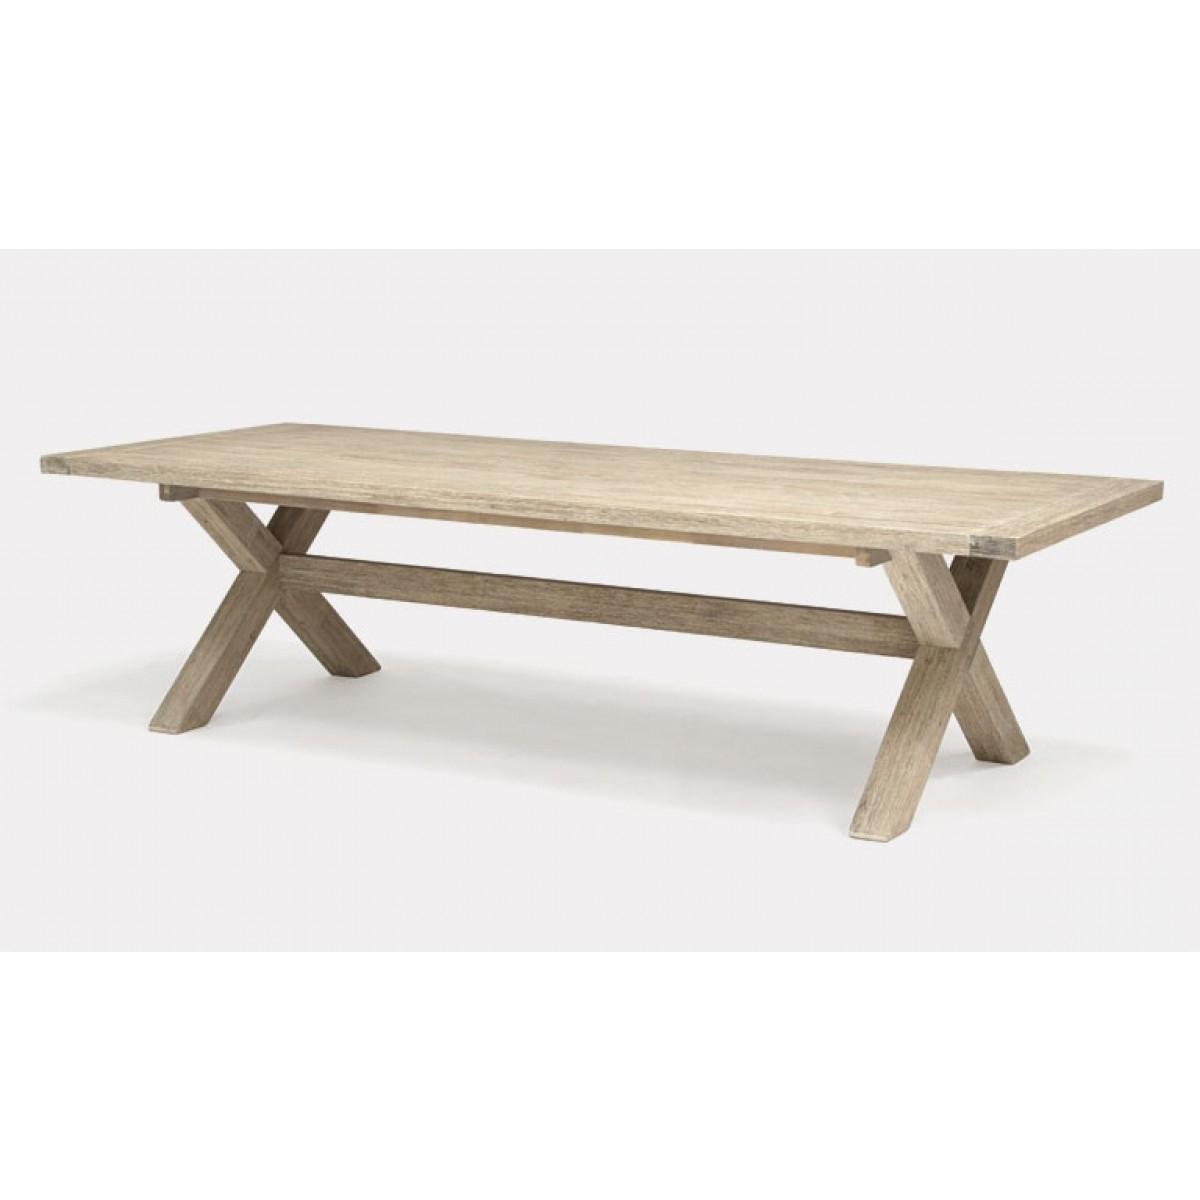 Cora Dining Tables Regarding Popular Kettler Cora Rectangular Dining Table 280 X 110 Cross Leg Best Price (View 8 of 25)